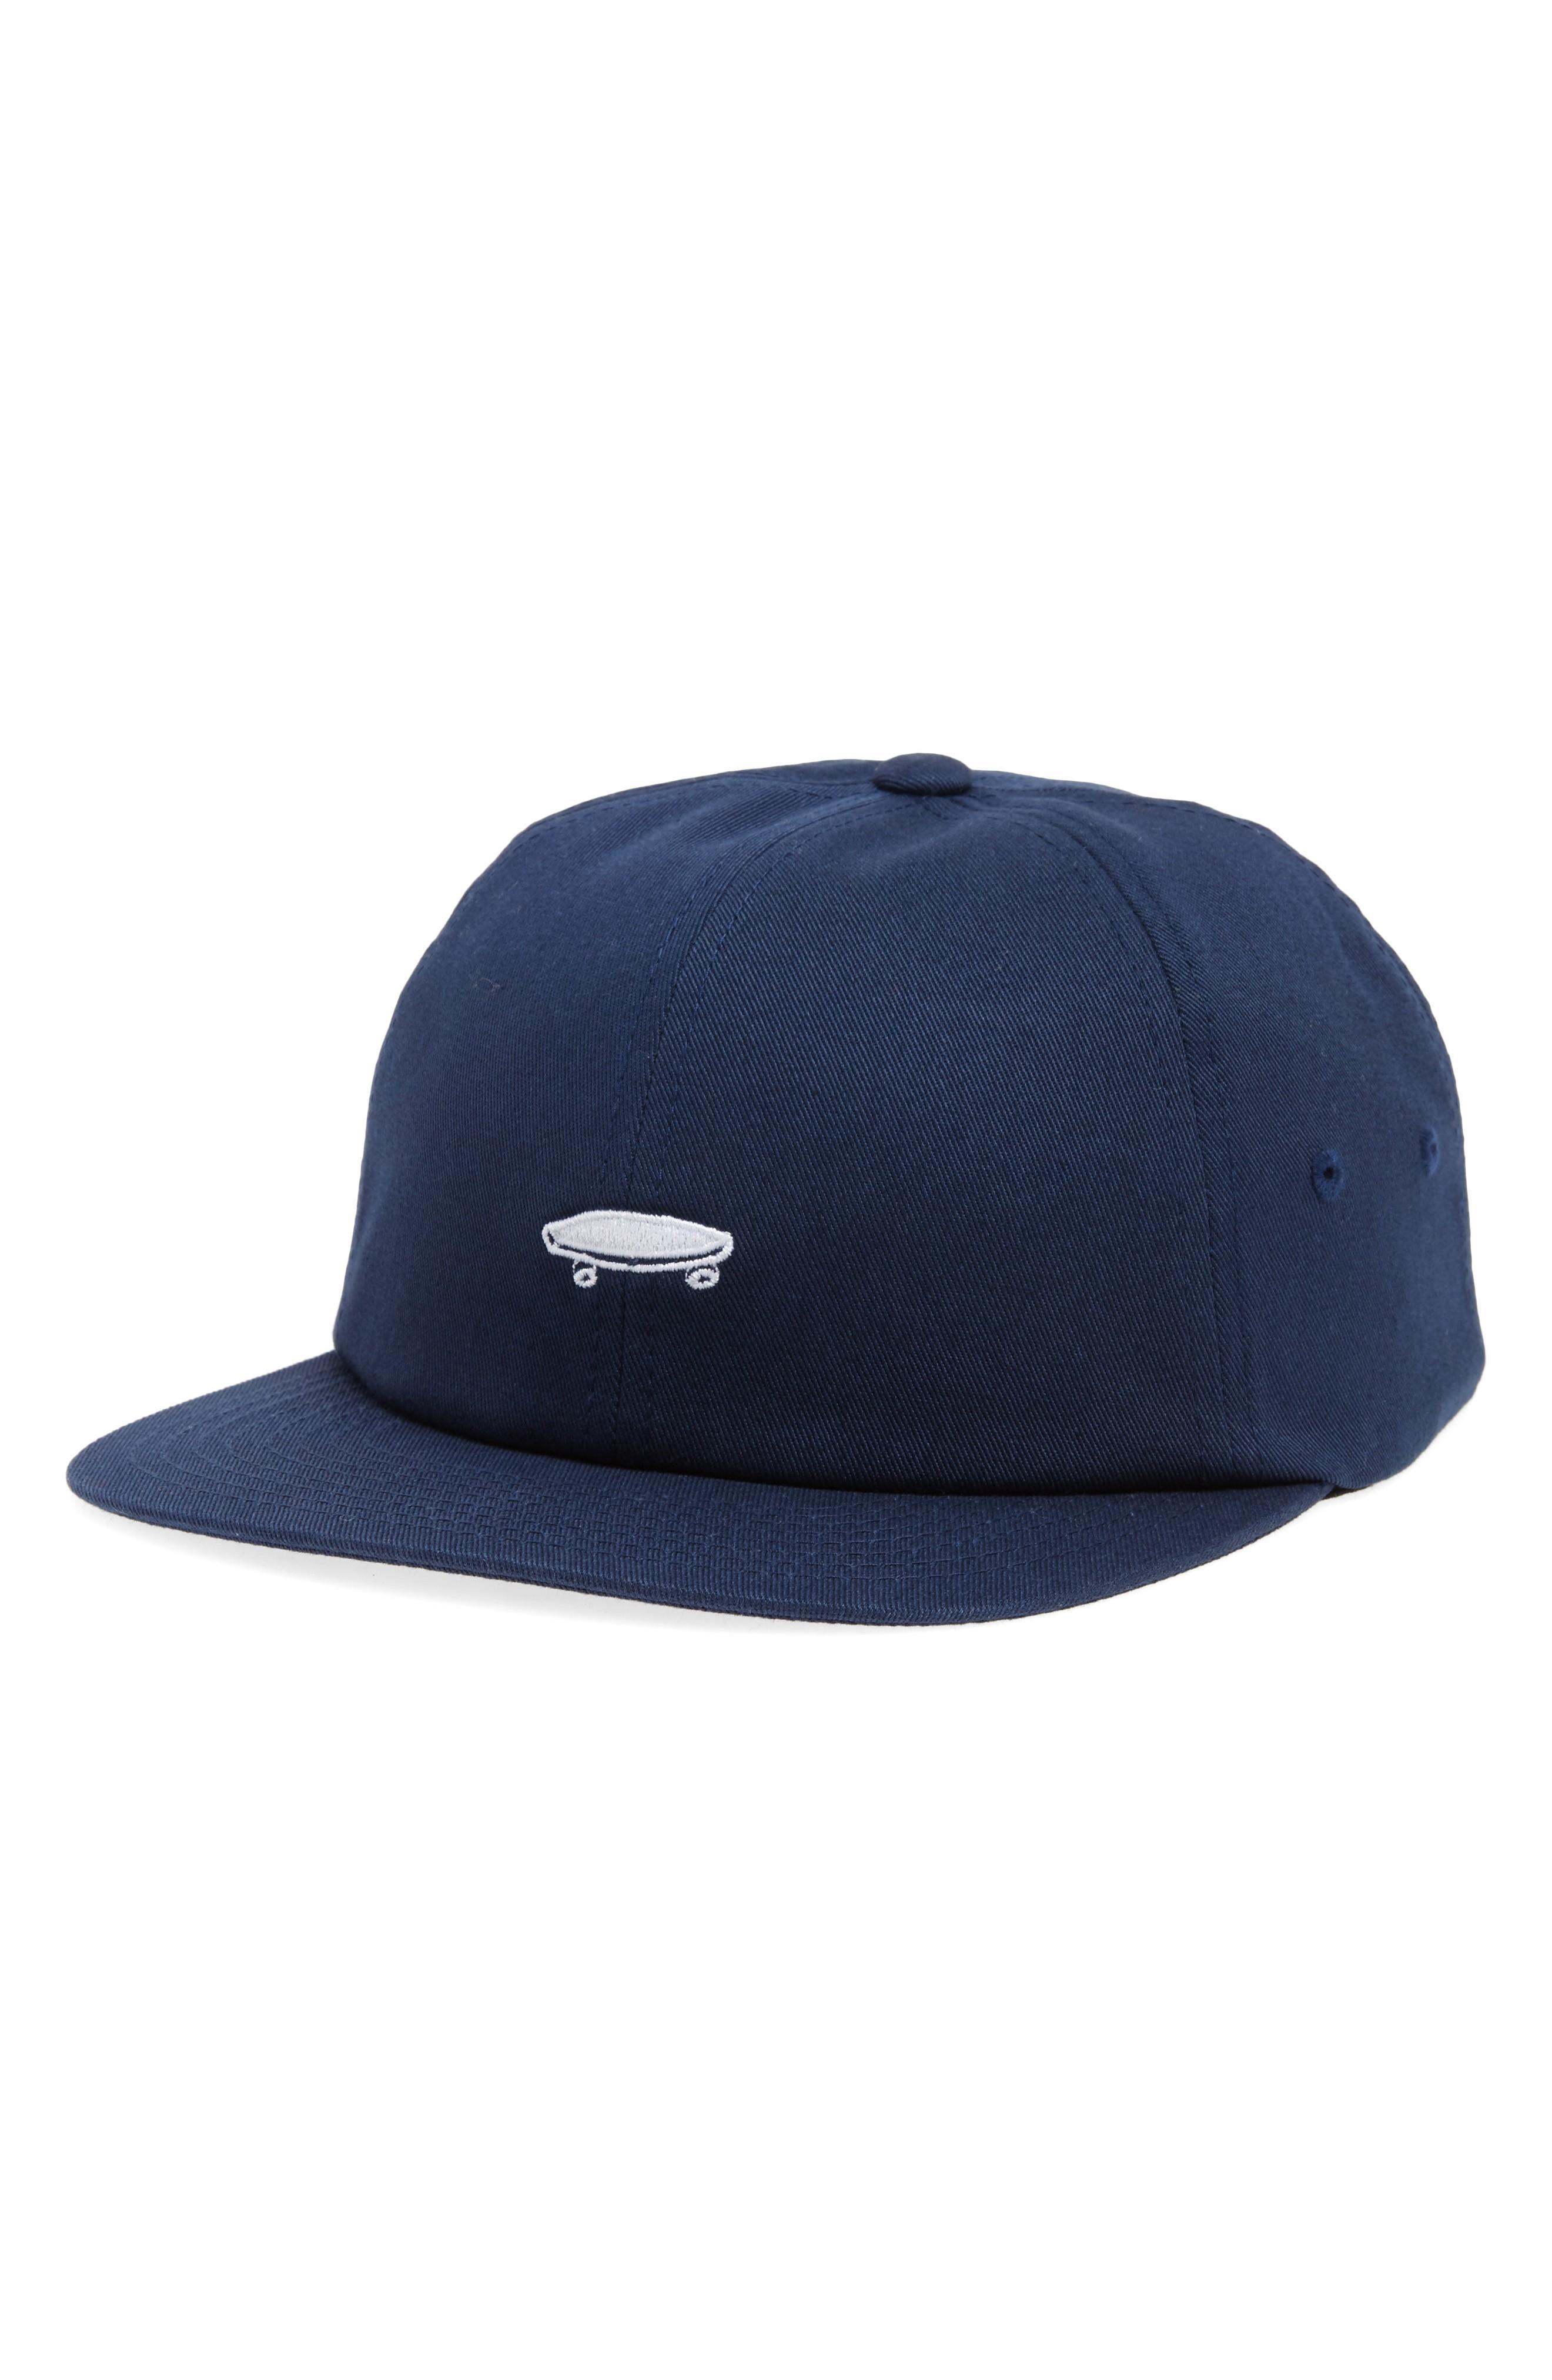 3f5952b3 Vans Salton Ii Ball Cap - Blue In Dress Blues | ModeSens